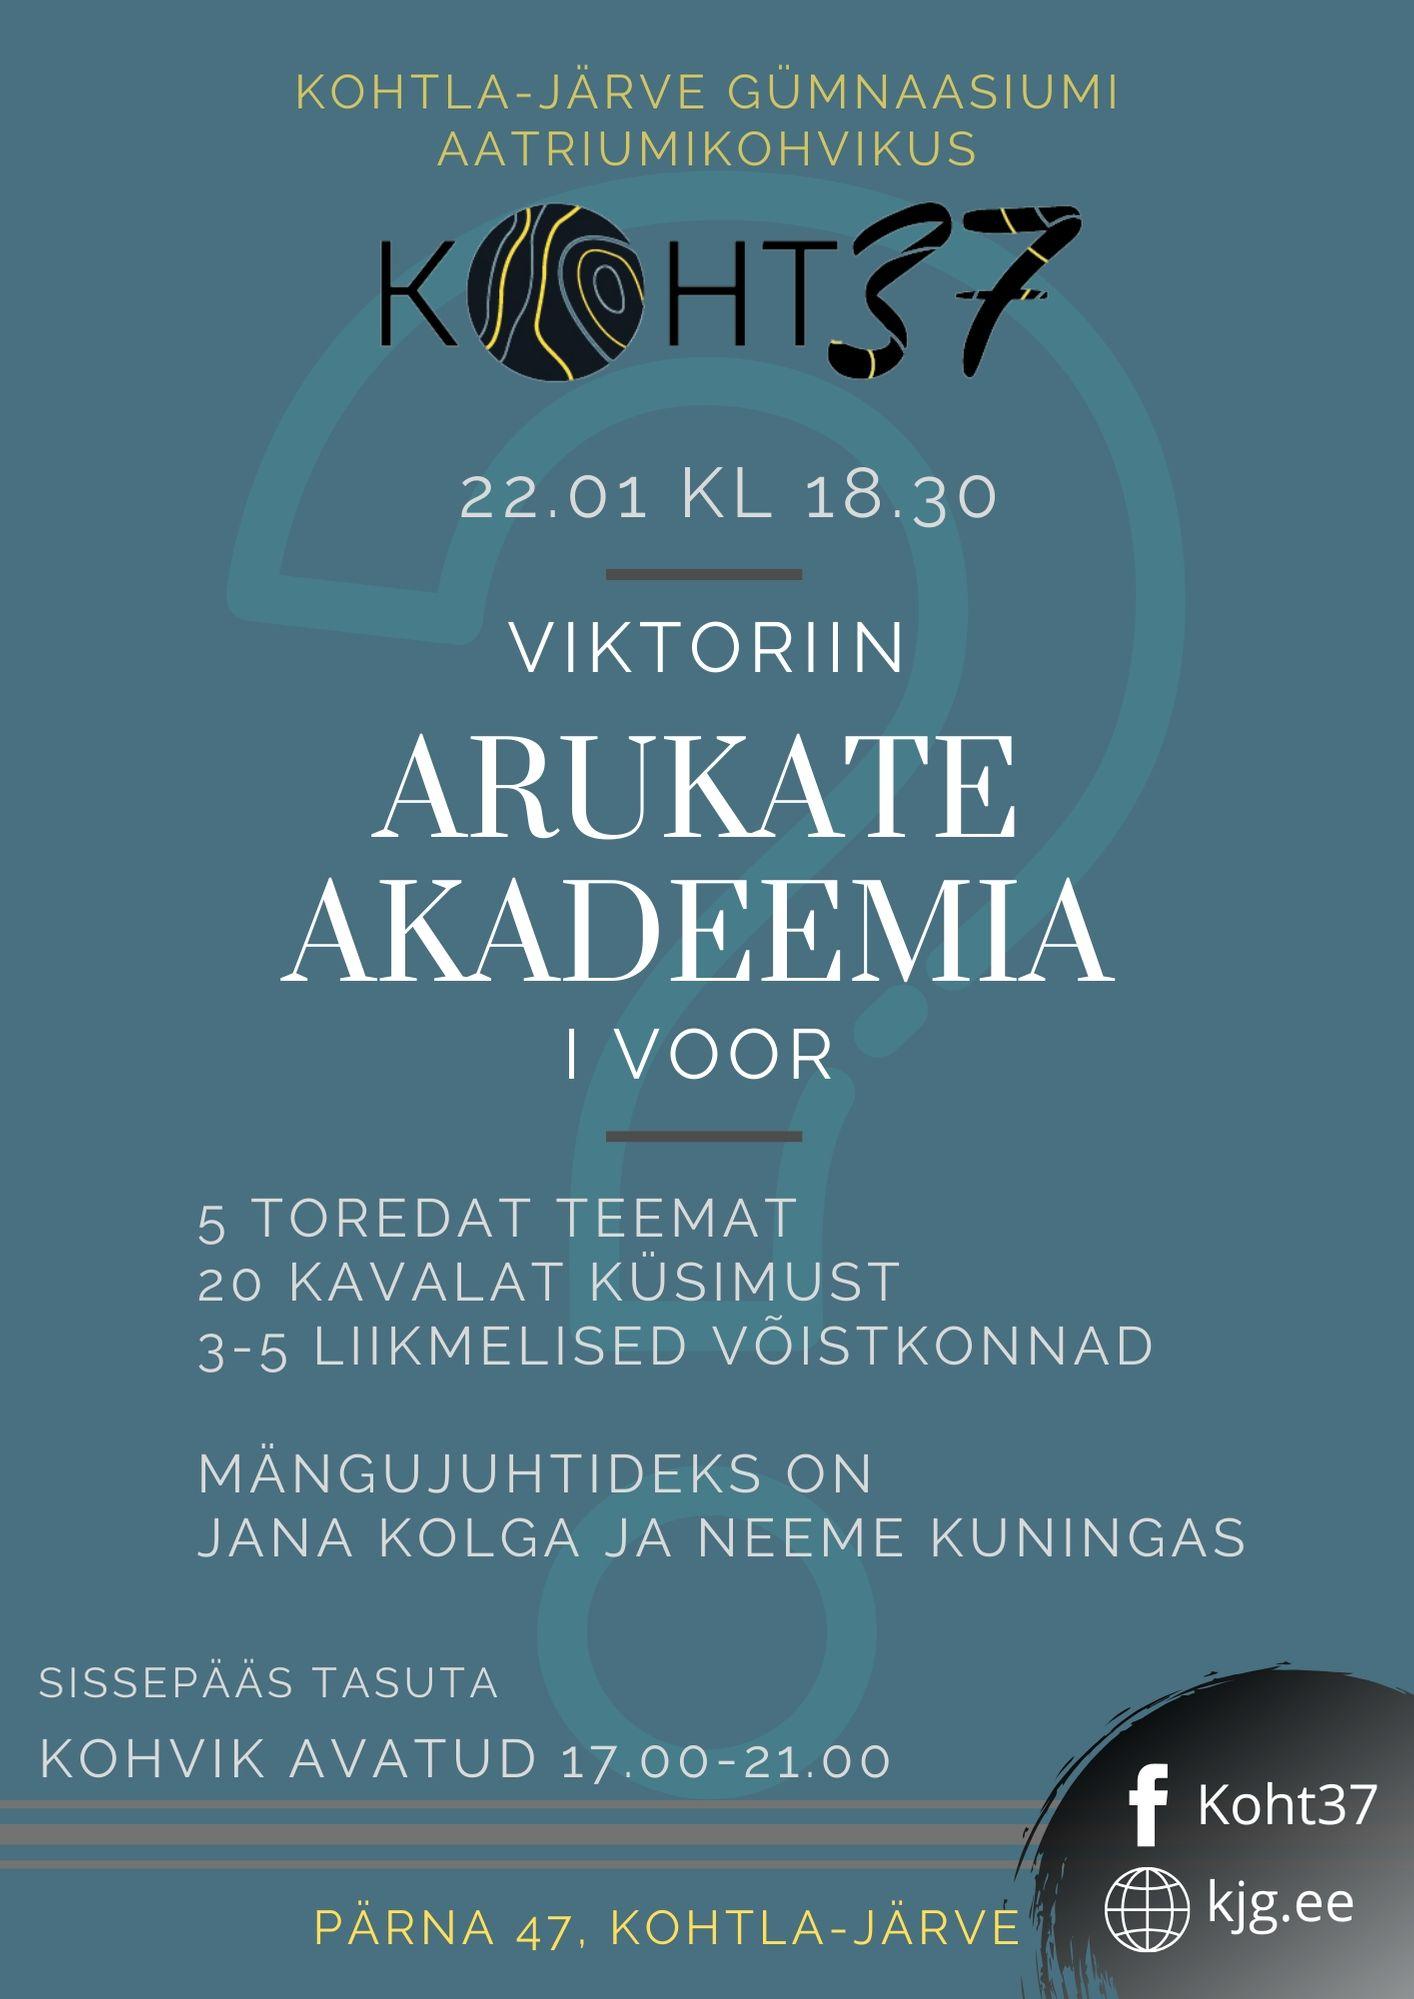 KOHT37: Viktoriin Arukate Akadeemia – 1. voor